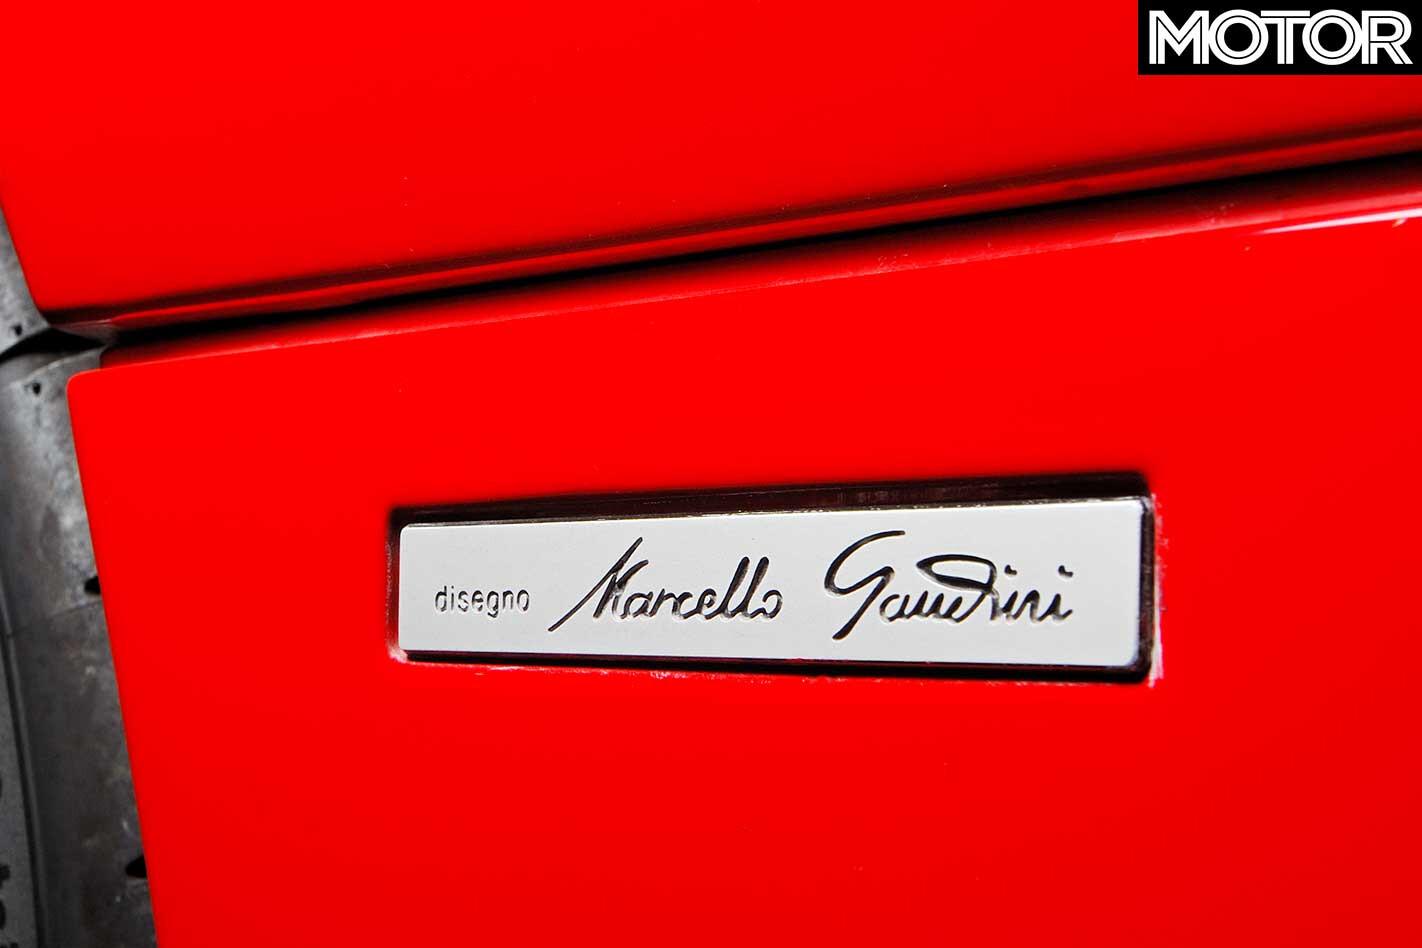 1990 Lamborghini Diablo Gandini Plate Jpg